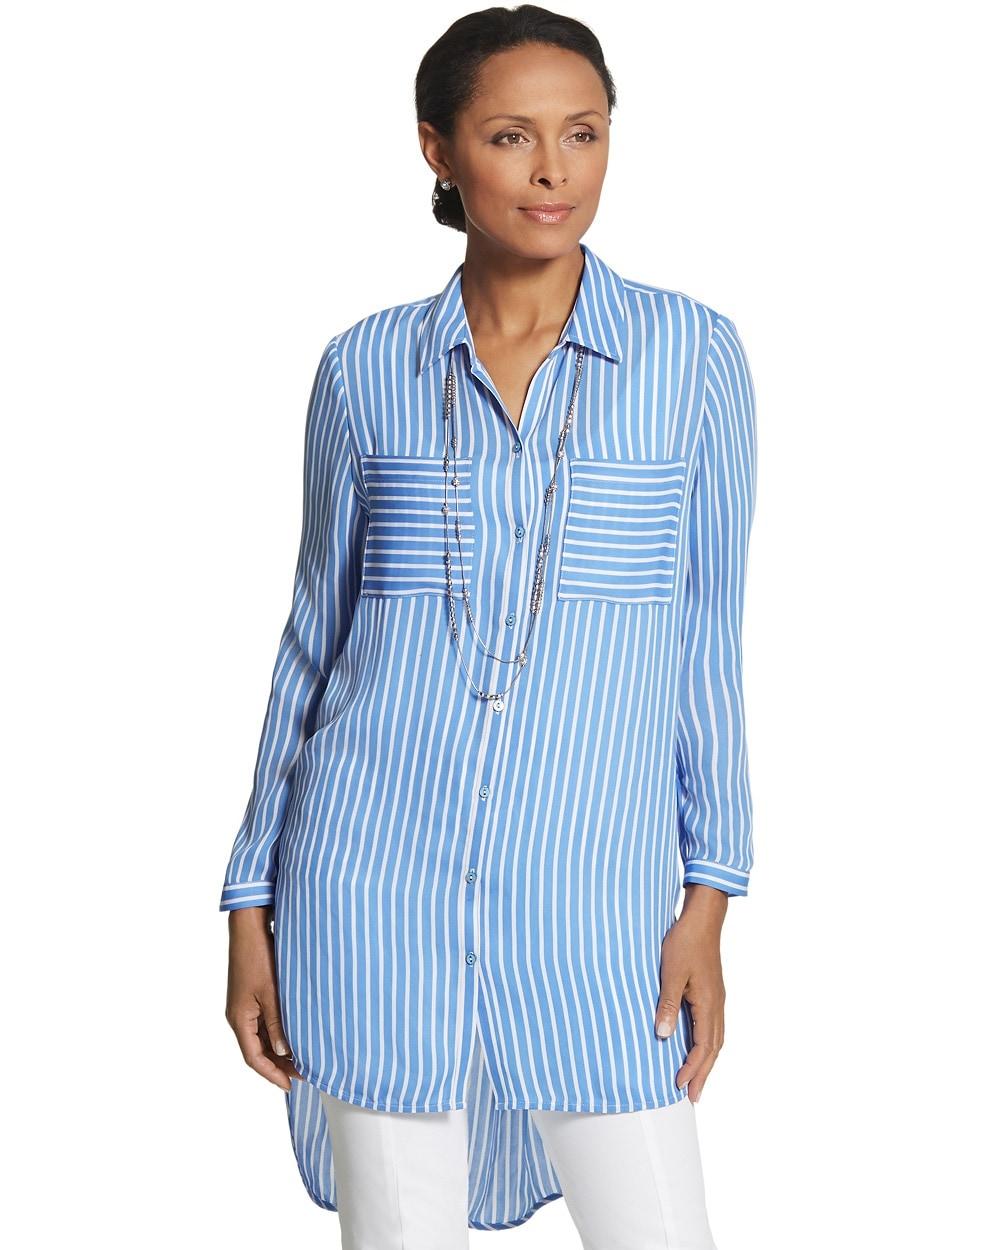 67d38ecc7520 Striped Pocket Play Nikki Shirt - Chico's